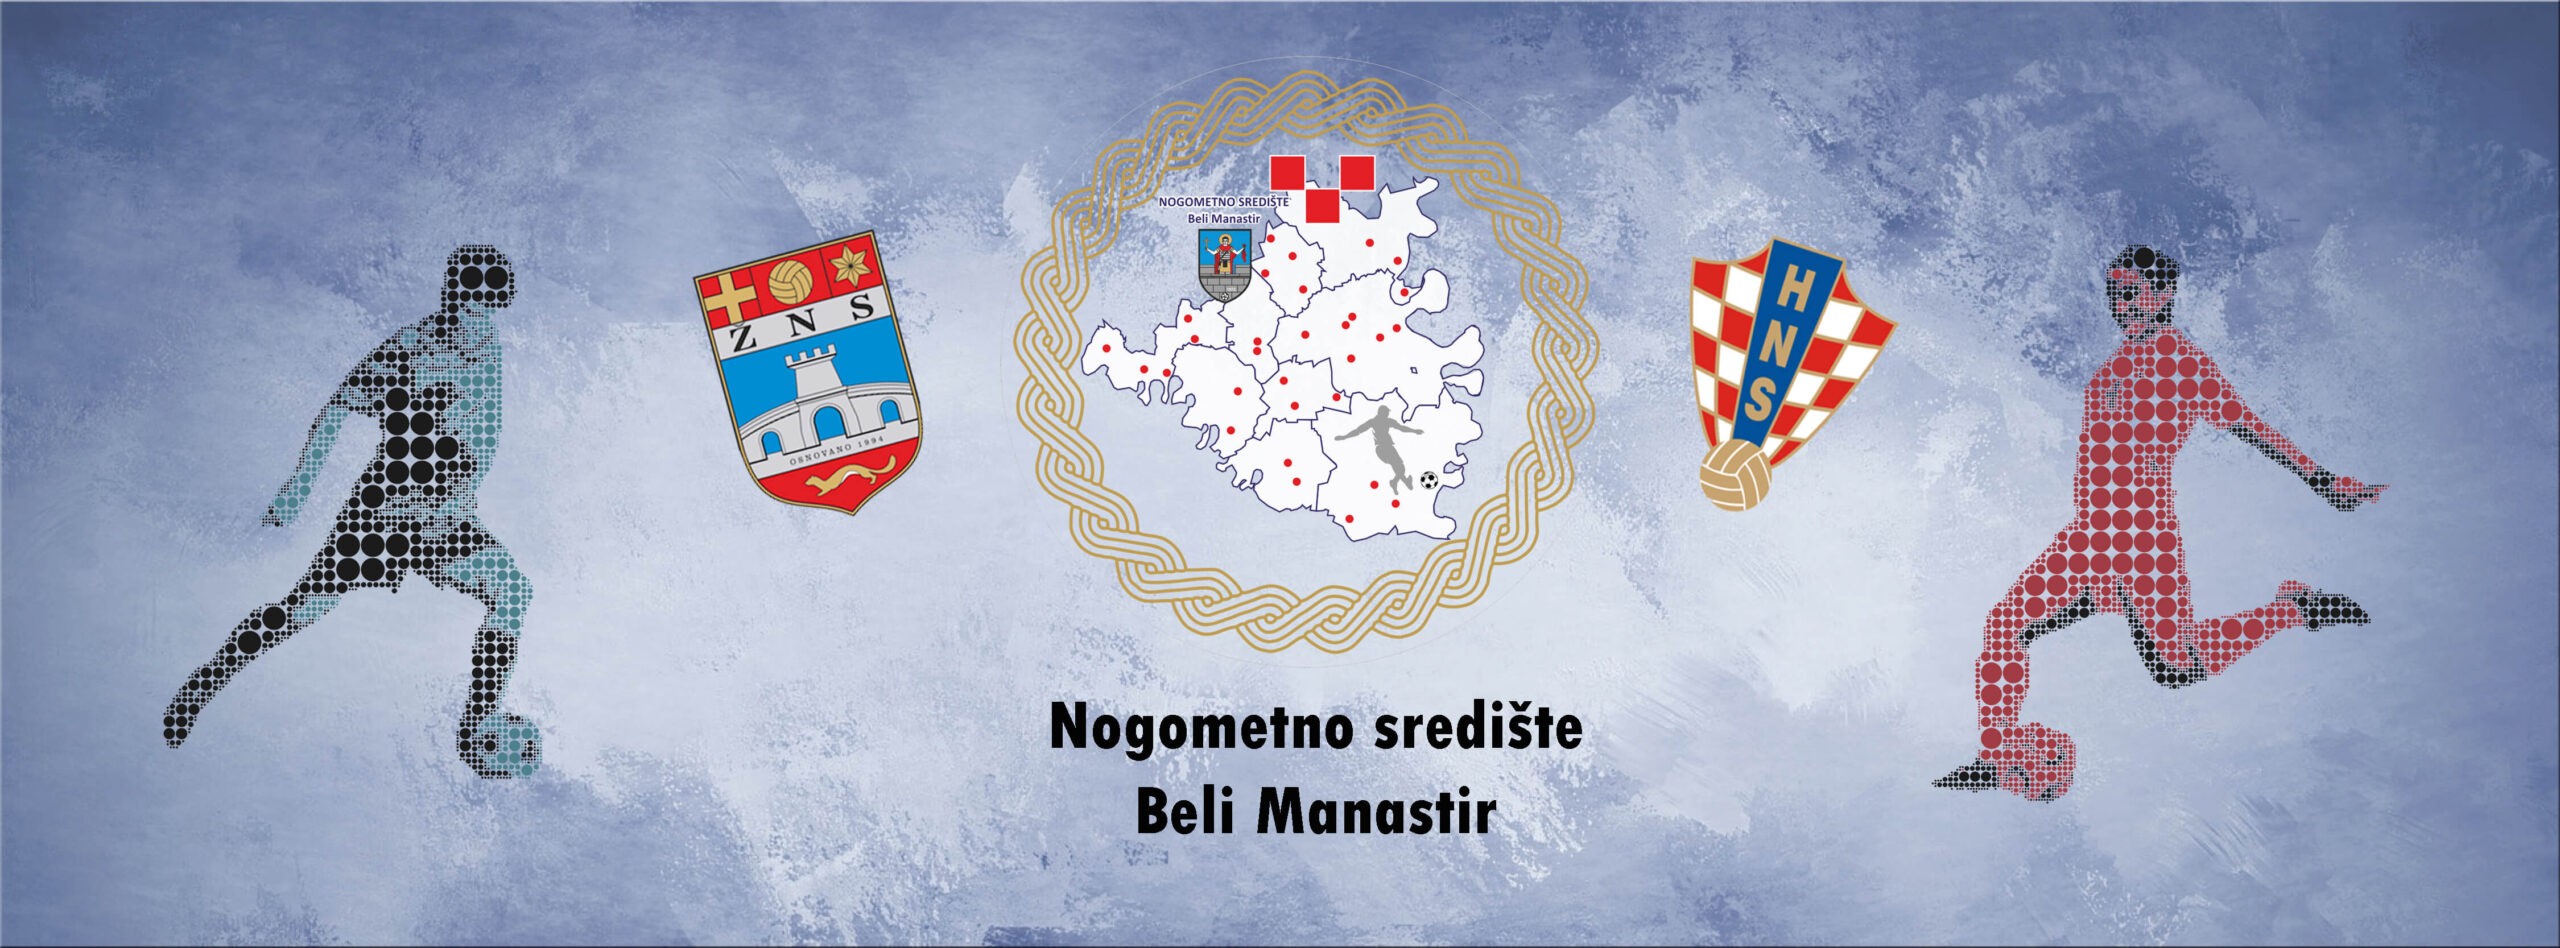 Nogometno središte Beli Manastir, županijski nogometni savez, hrvatski nogometni saavez